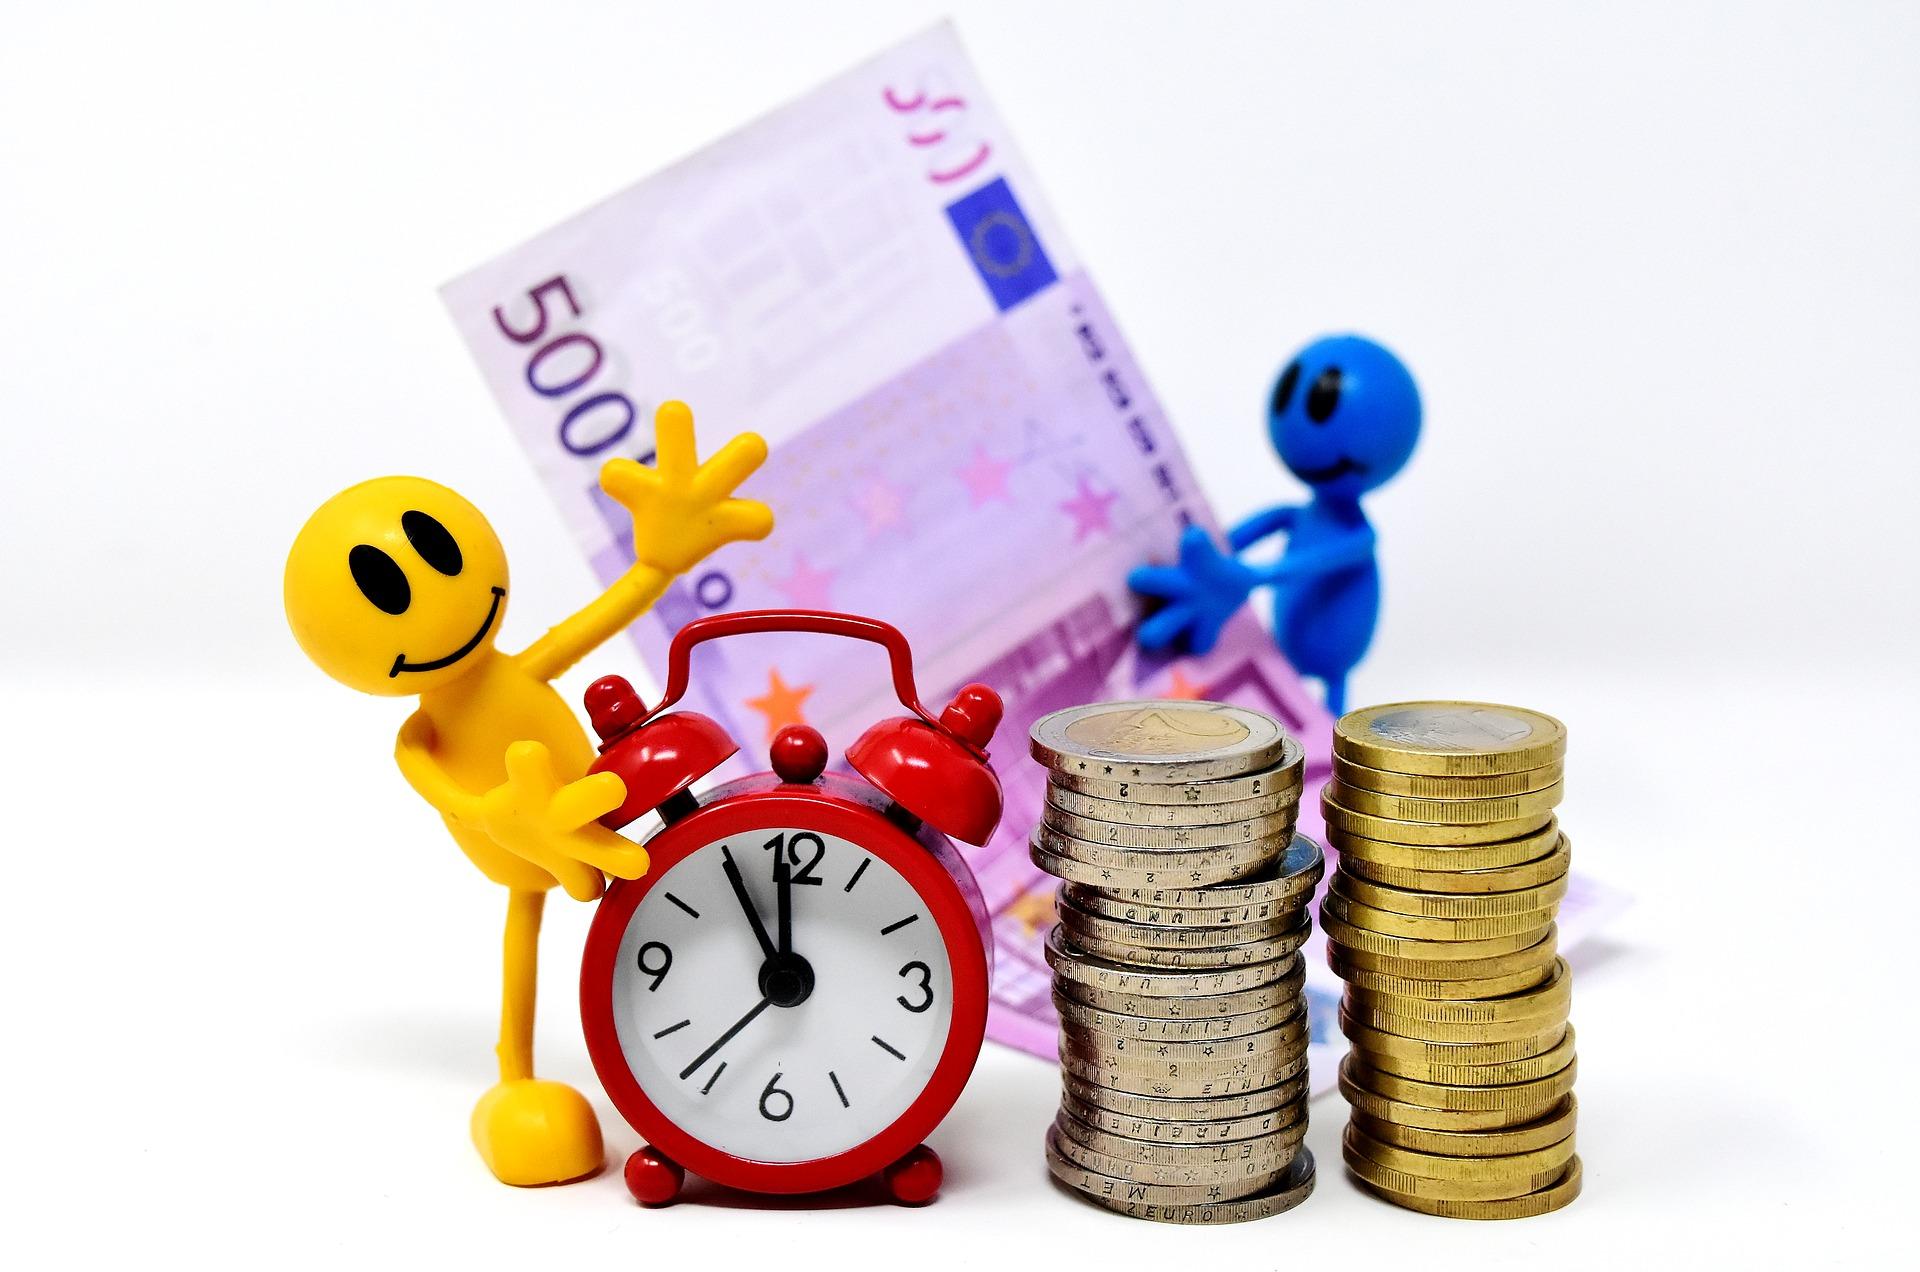 time-is-money-3290839_1920のアイキャッチ画像